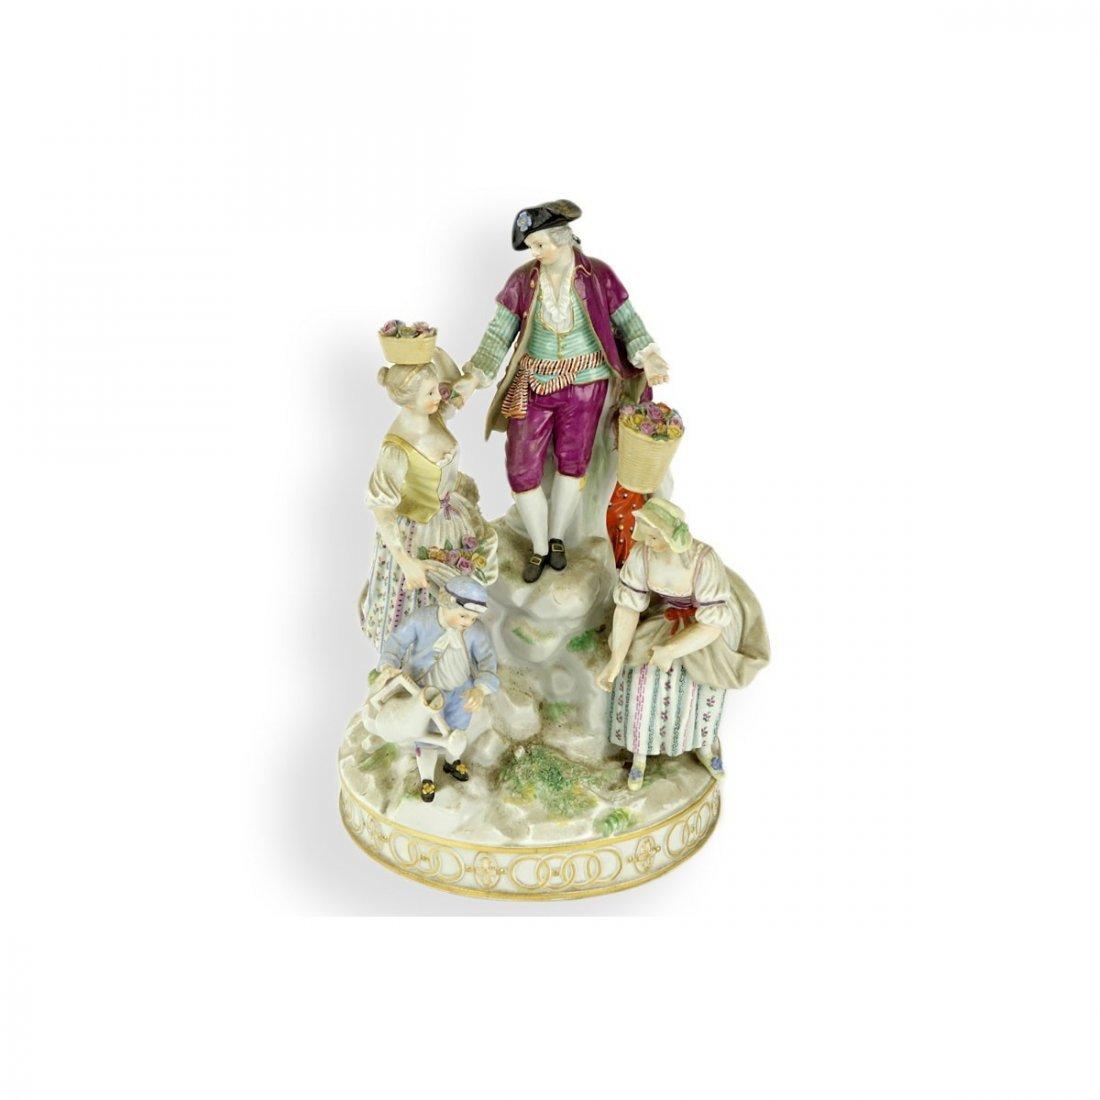 19th Century Meissen Hand Painted Porcelain Figural